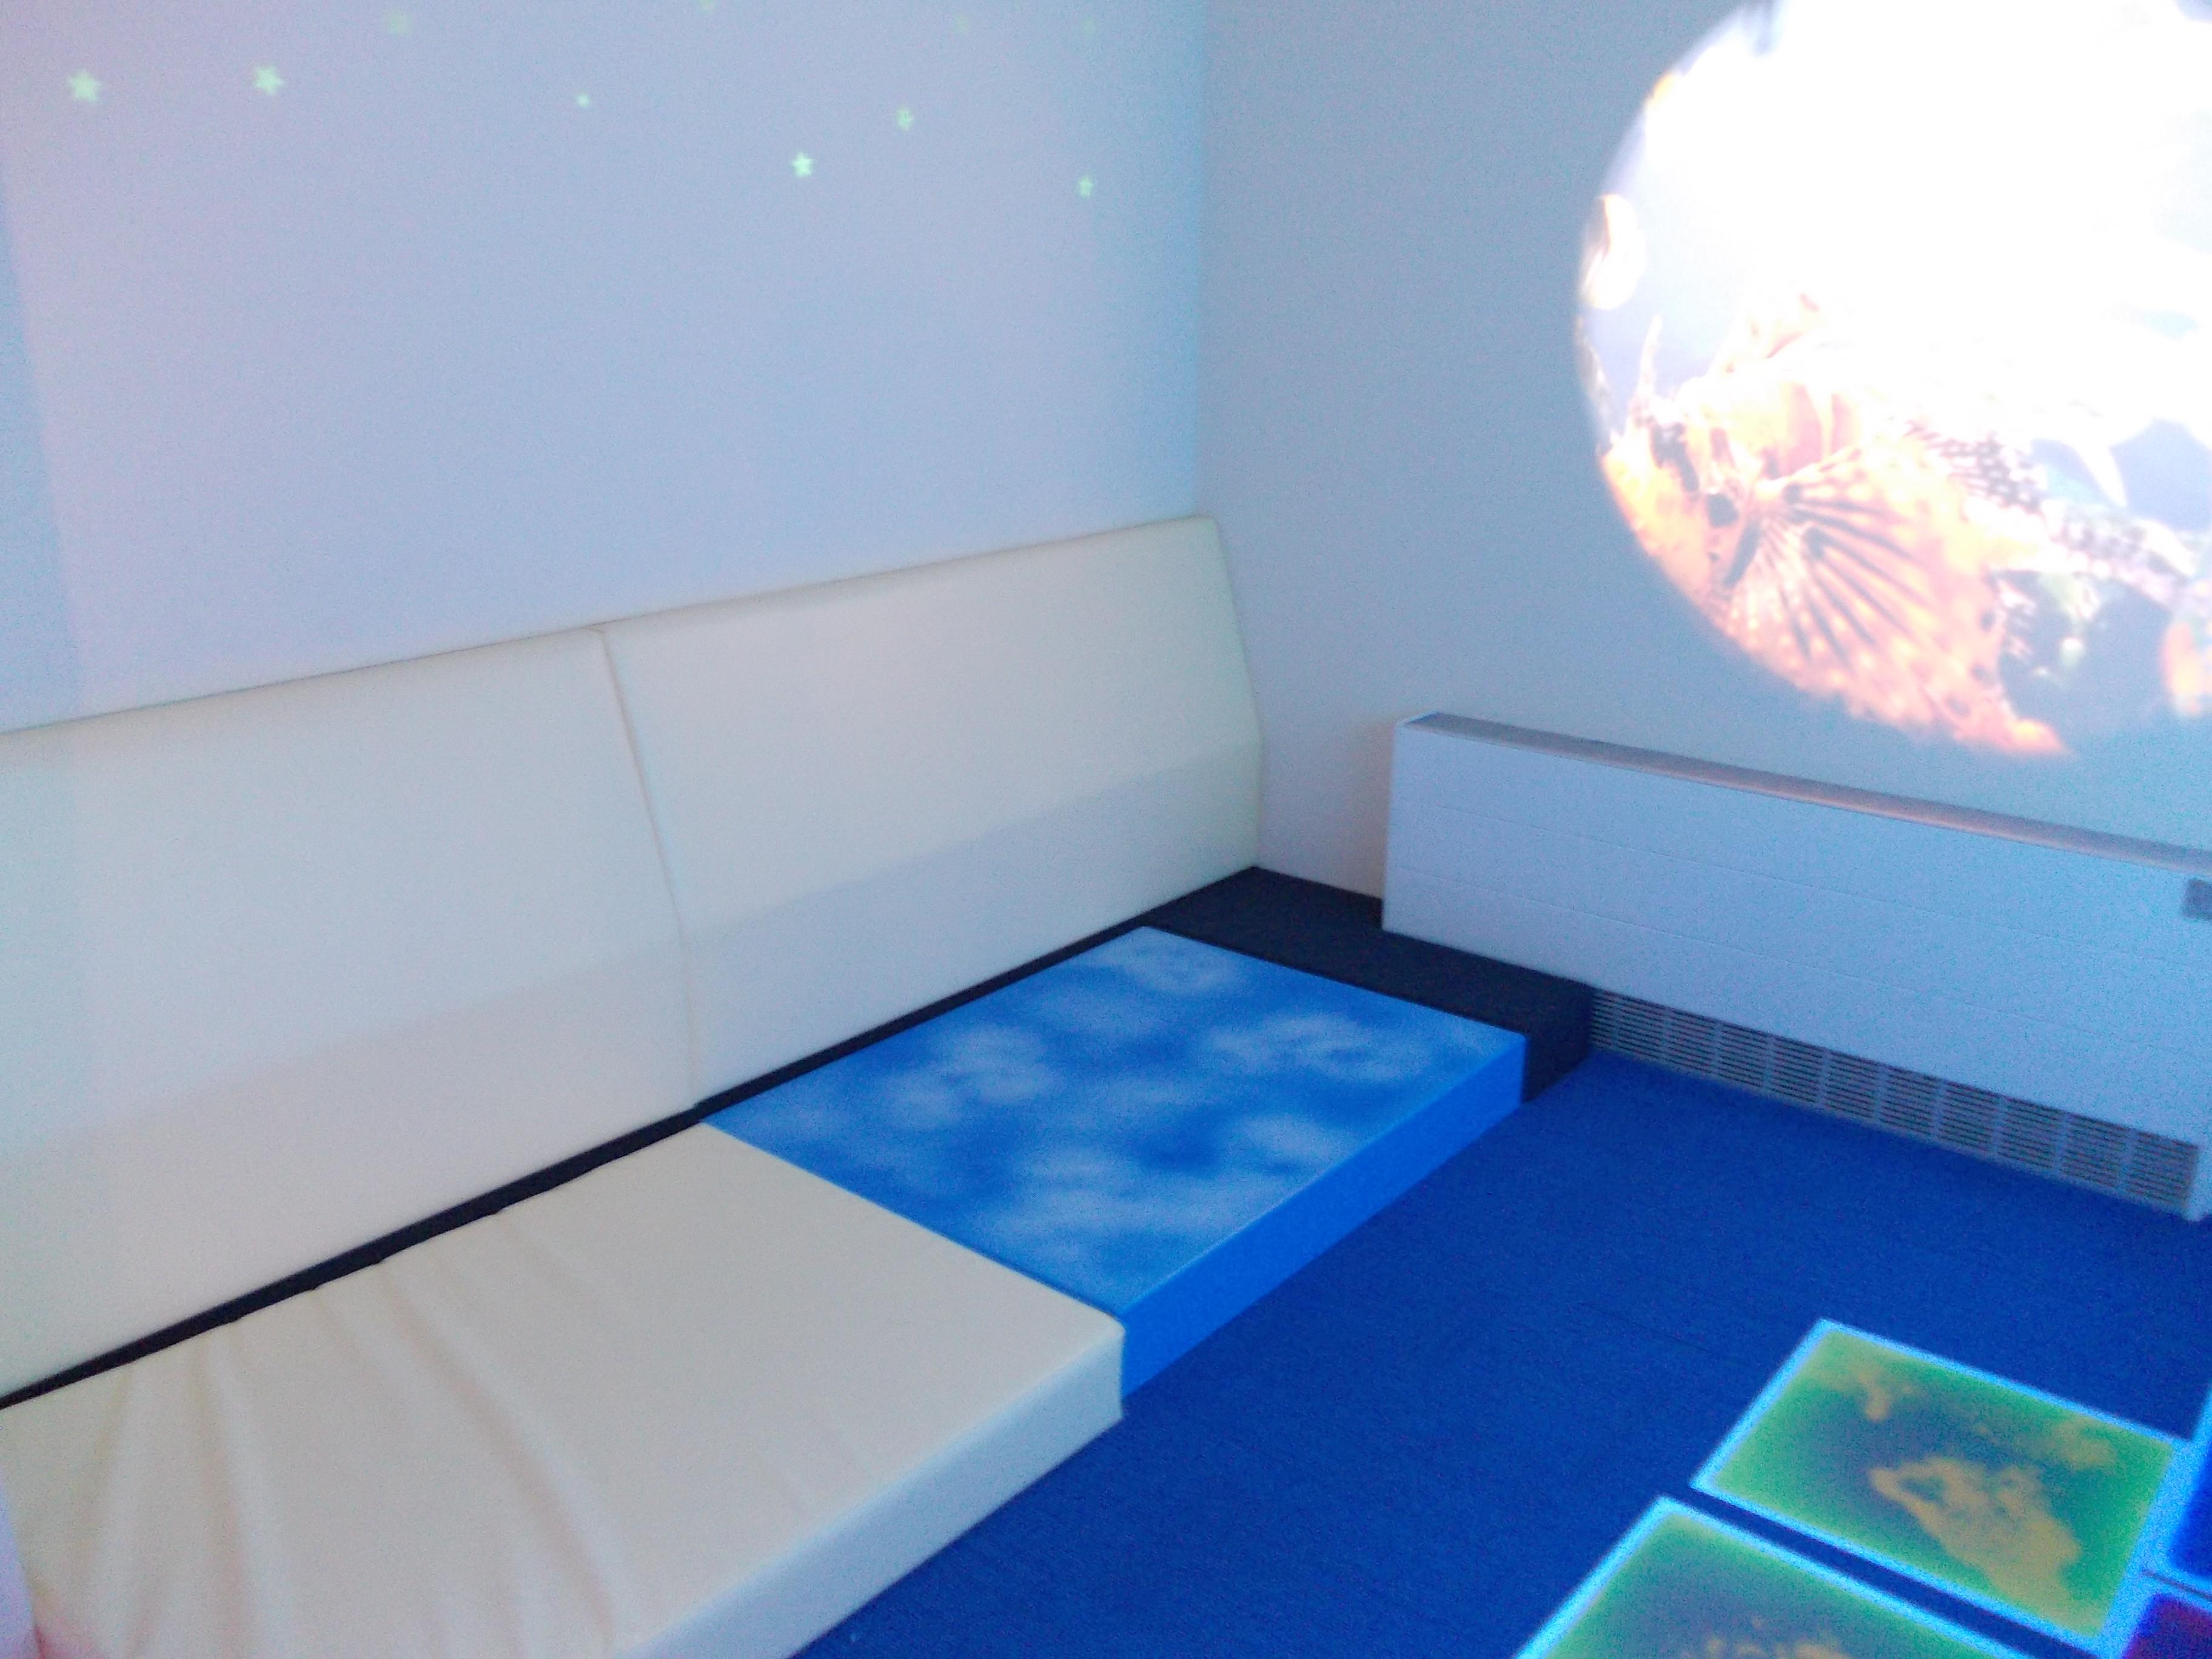 Main Sensory Room - Soft Seating & Sound Area